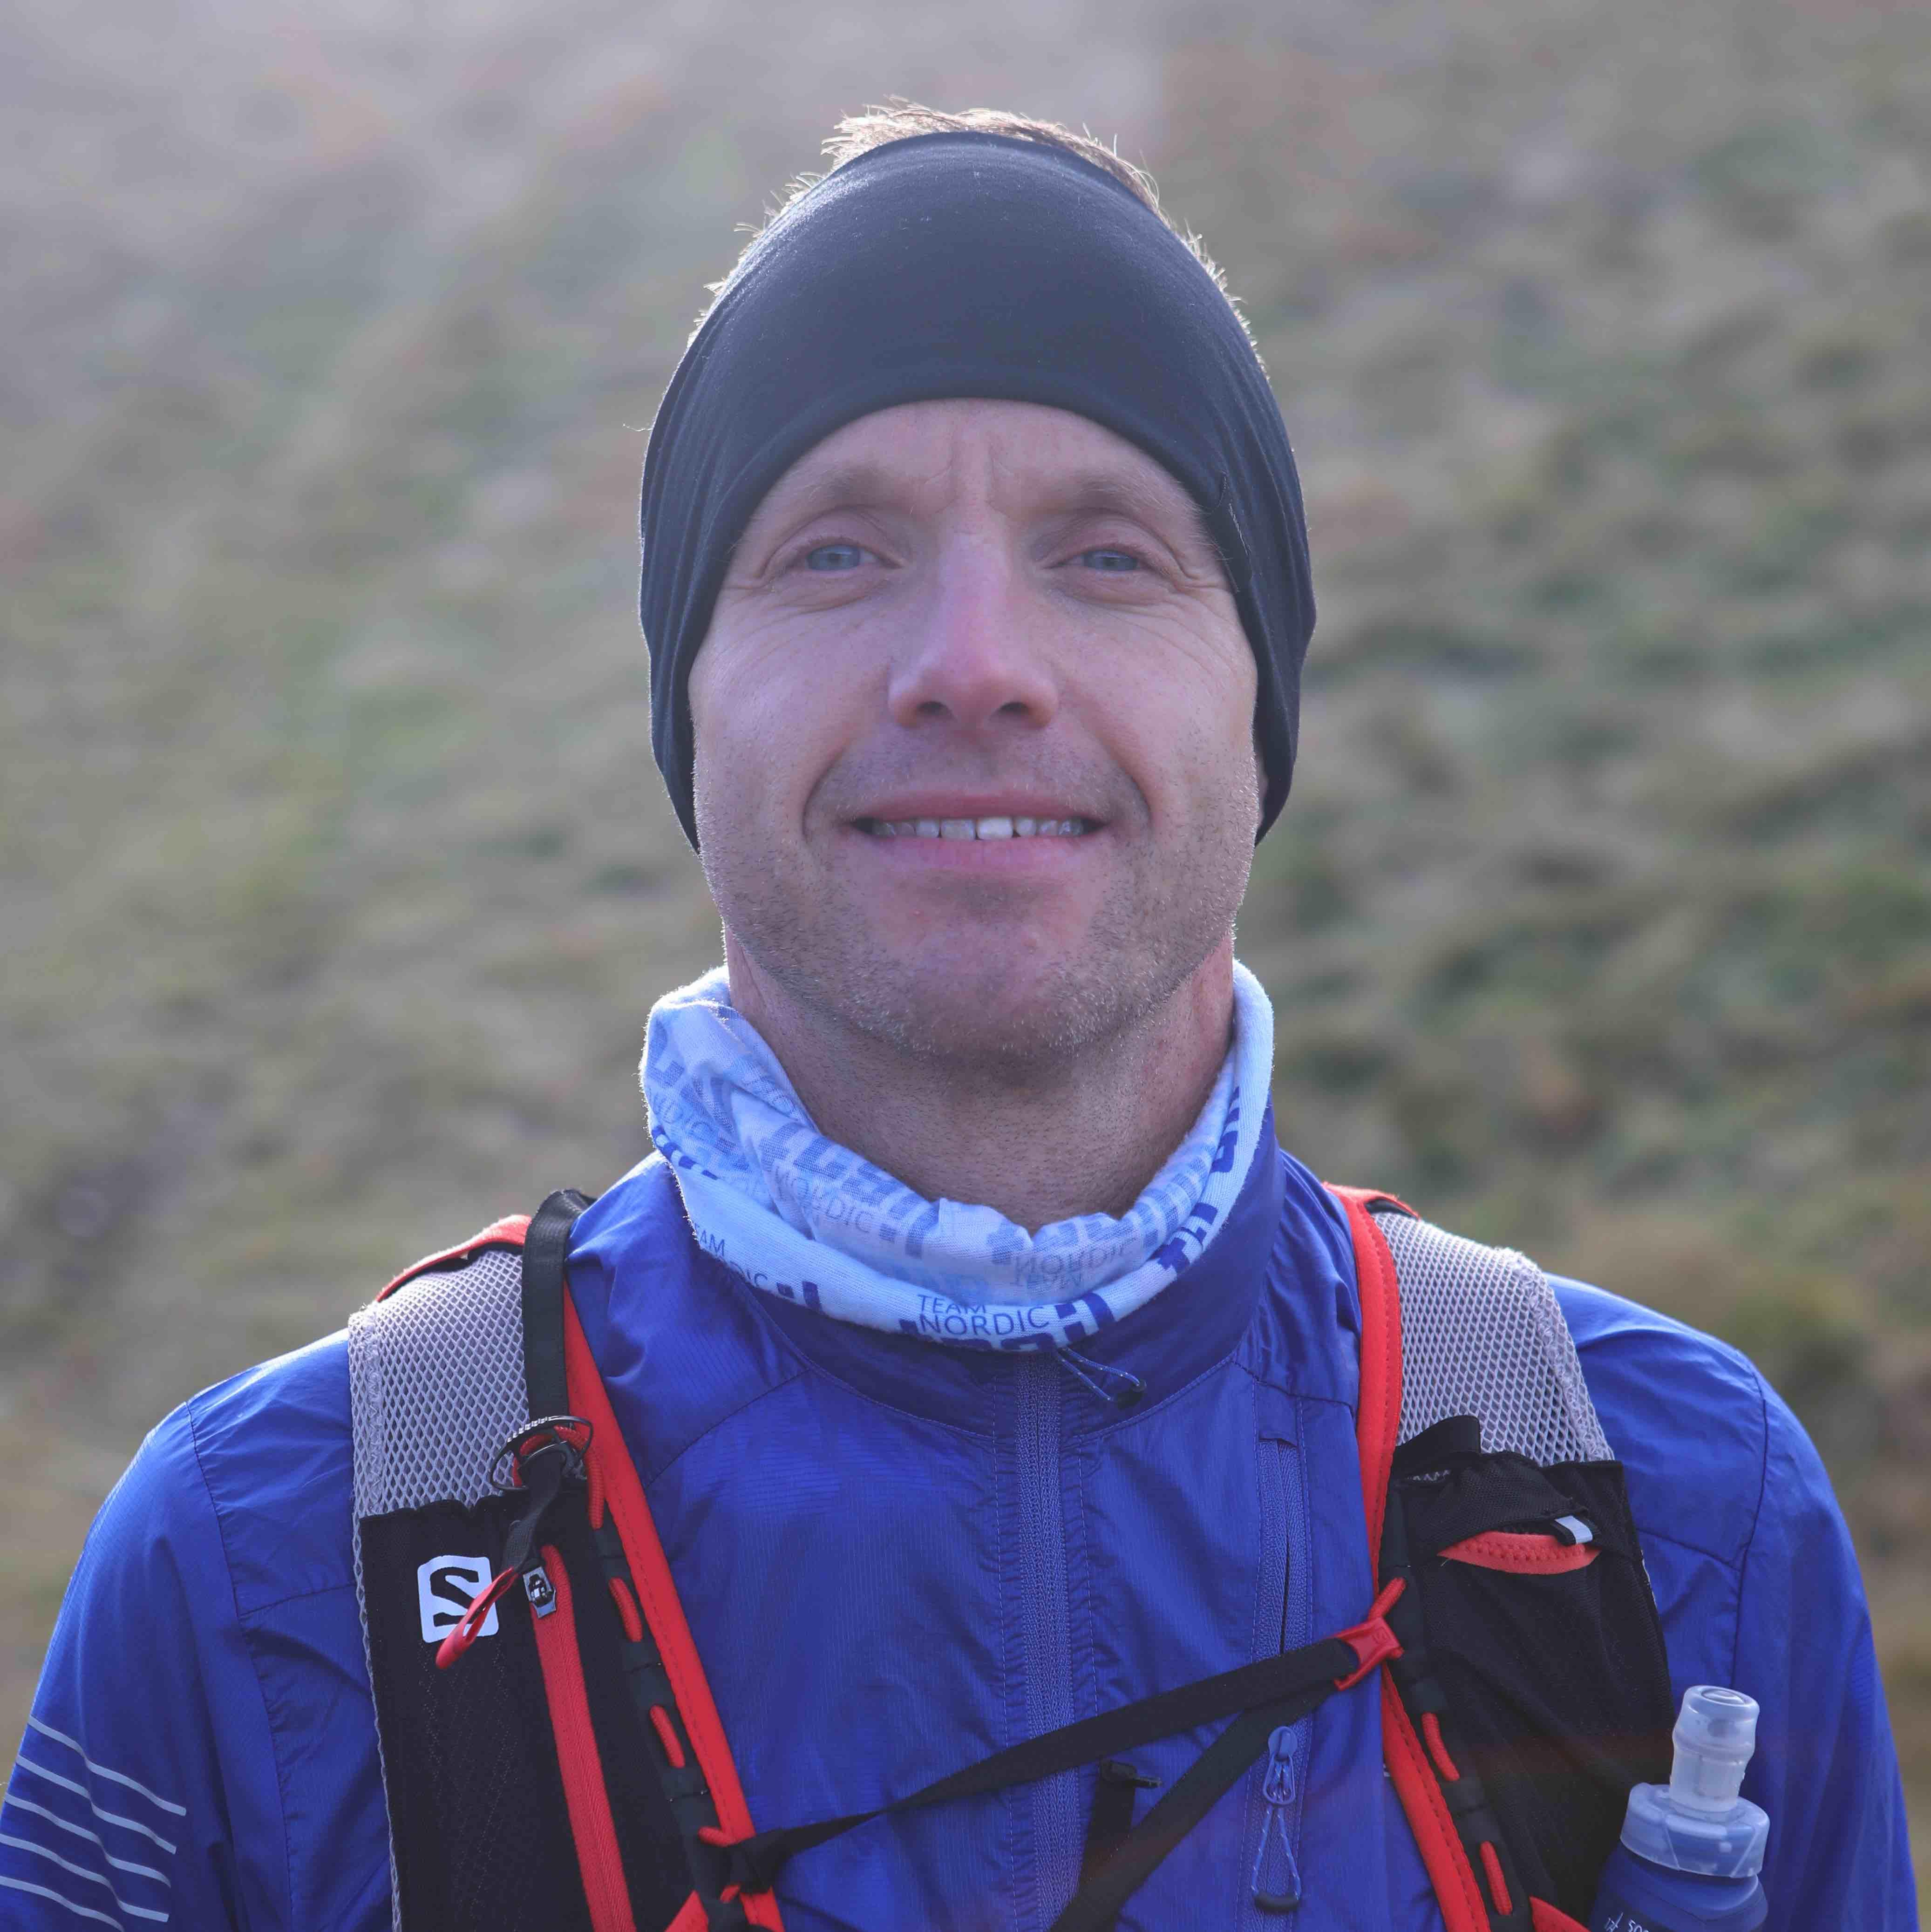 Peter Klingvall